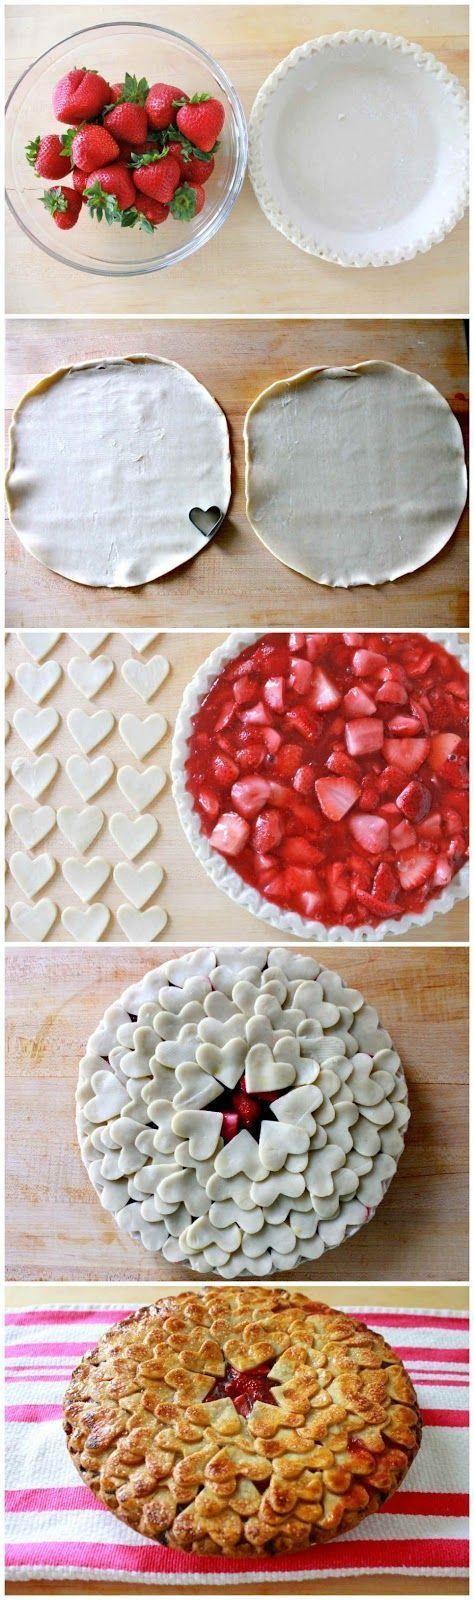 Pie de fresa con forma de corazón como regalo. #PostreDeSanValentin